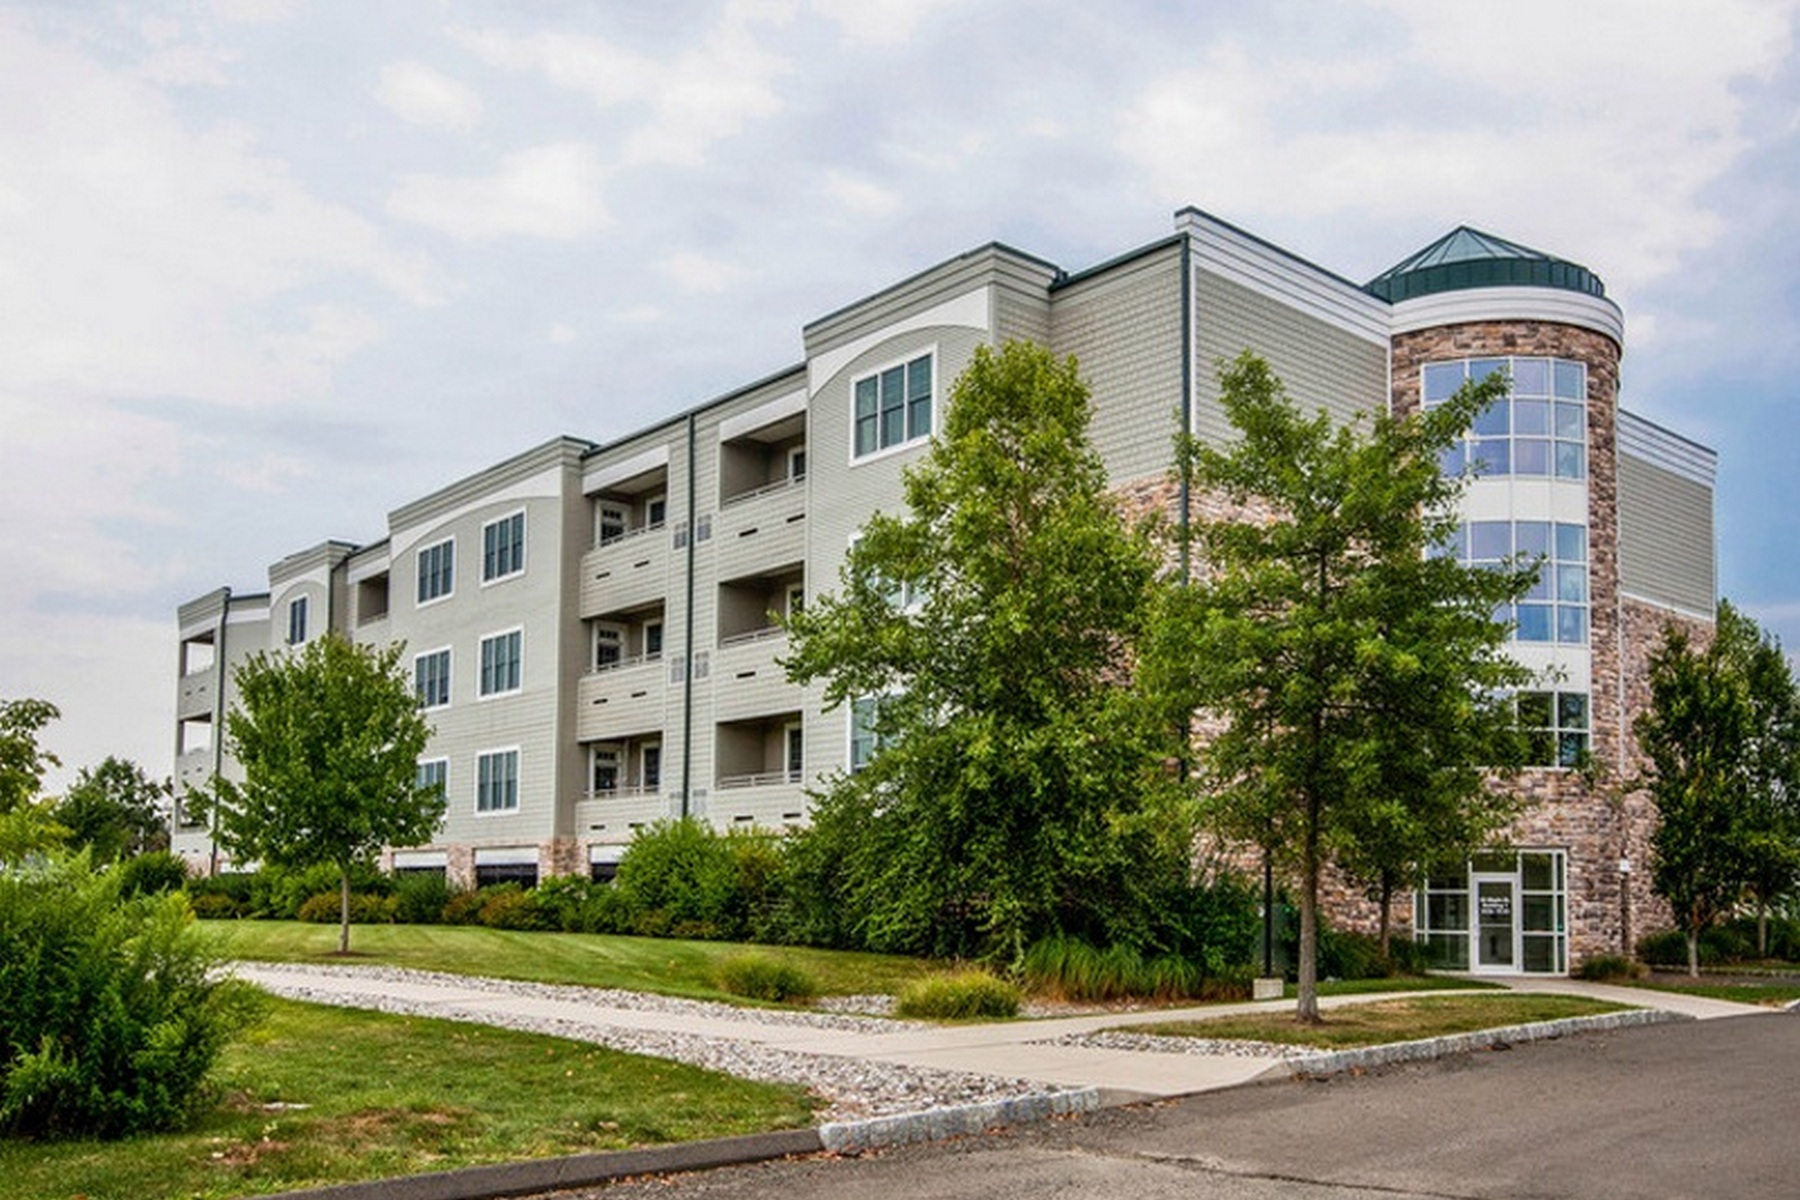 Condominium for Sale at 60 Maple St 60 Maple St 29 Branford, Connecticut 06405 United States